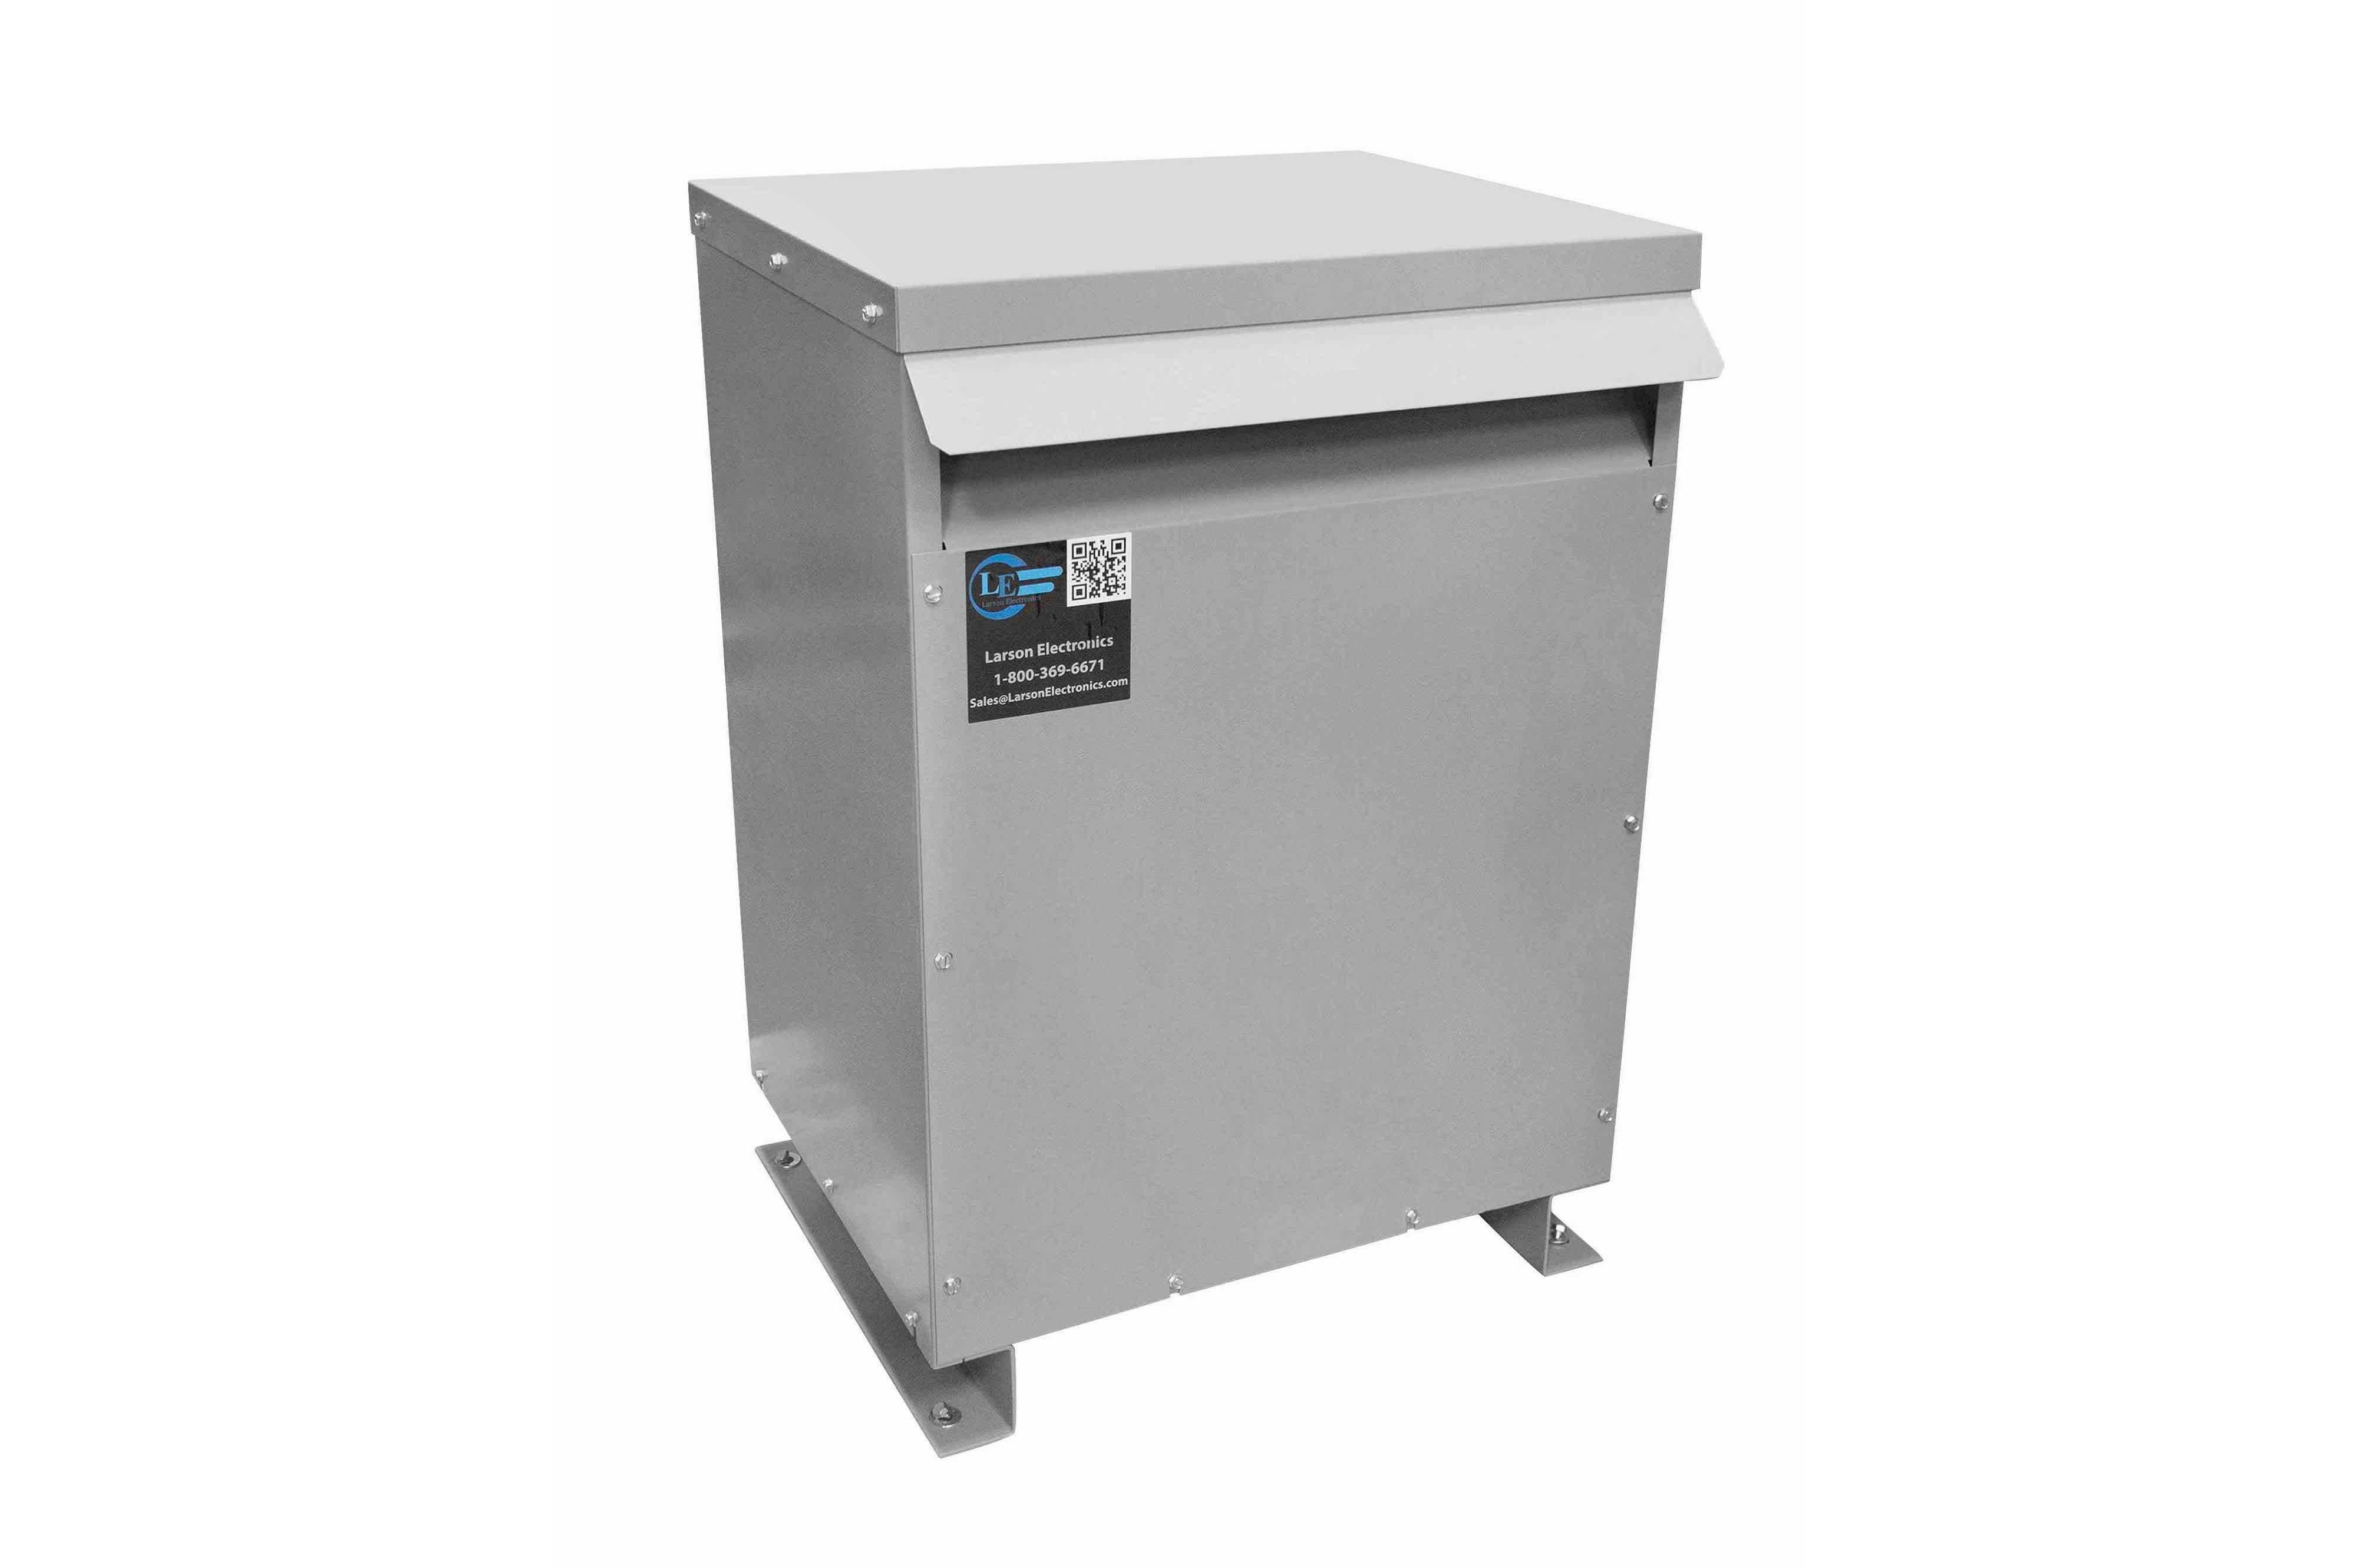 112.5 kVA 3PH DOE Transformer, 440V Delta Primary, 208Y/120 Wye-N Secondary, N3R, Ventilated, 60 Hz